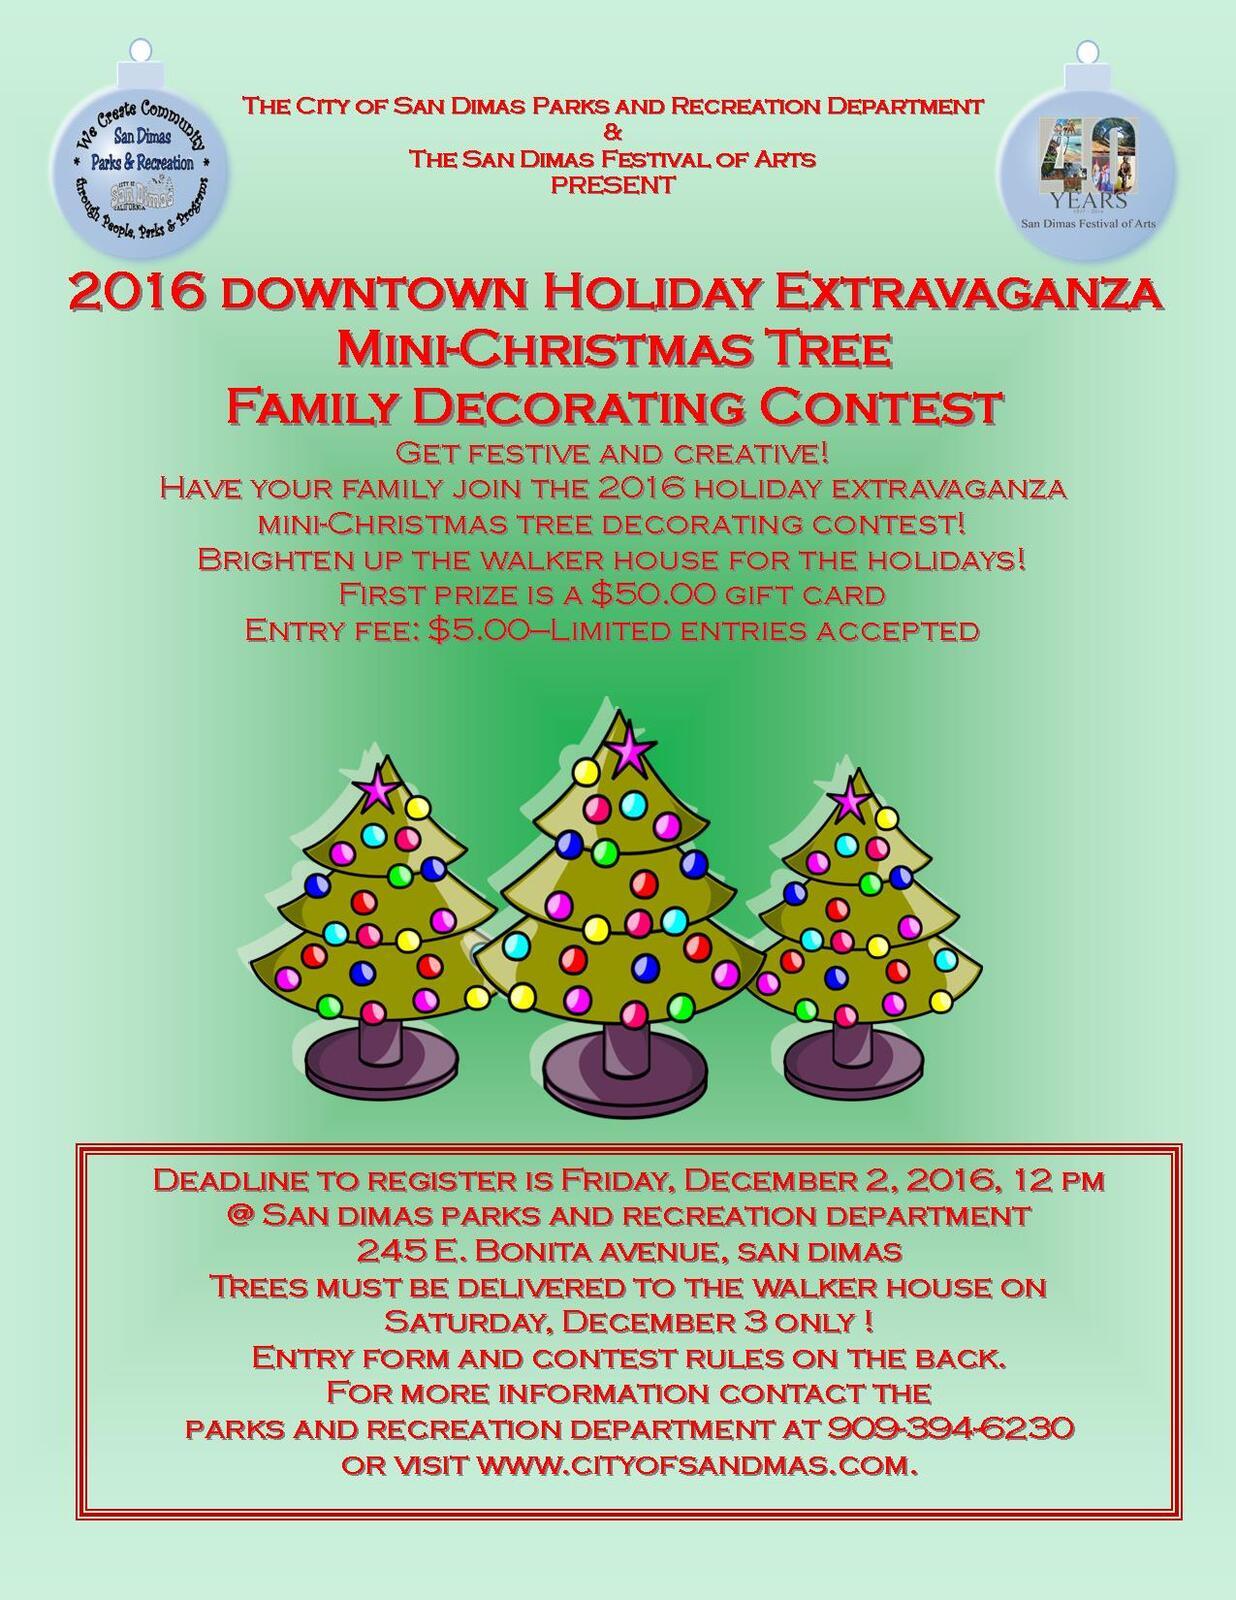 San Dimas Events Holiday Extravaganza And Tree Decorating Contest Los Angeles County Sheriff Mdash Nextdoor Nextdoor